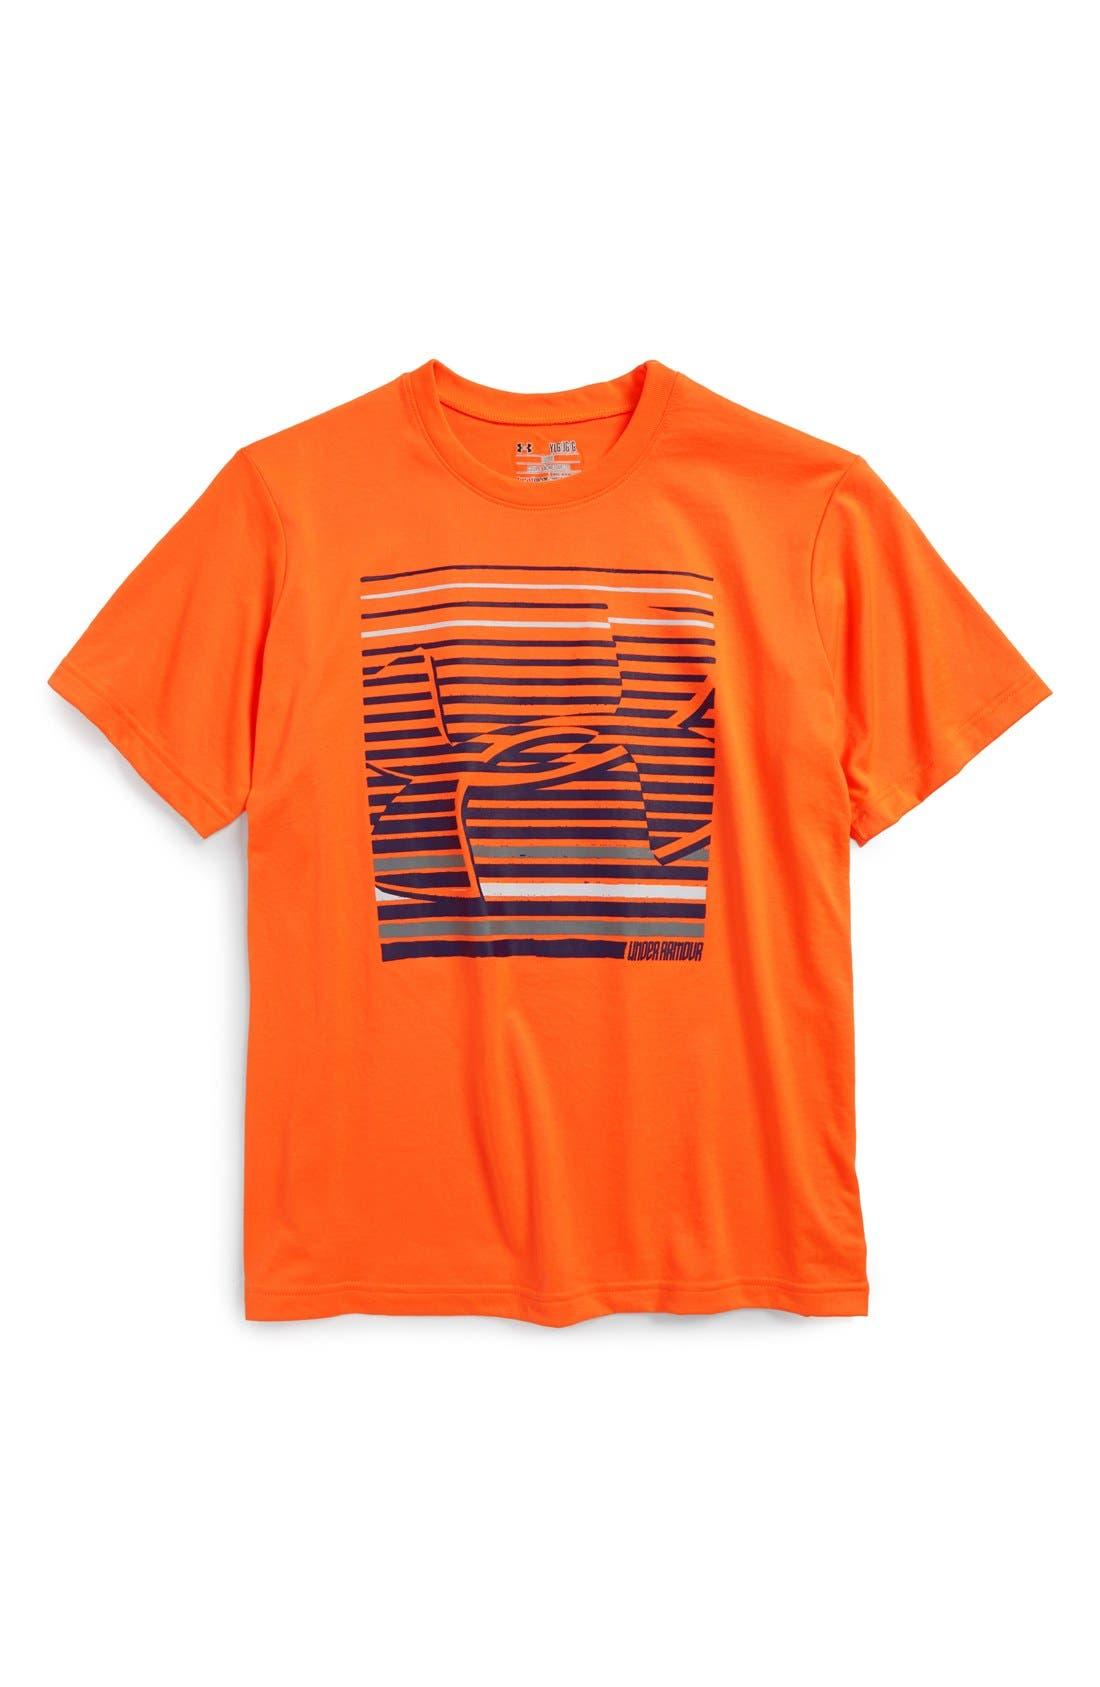 Alternate Image 1 Selected - Under Armour 'UA Strizipes' UA Tech™ T-Shirt (Big Boys)